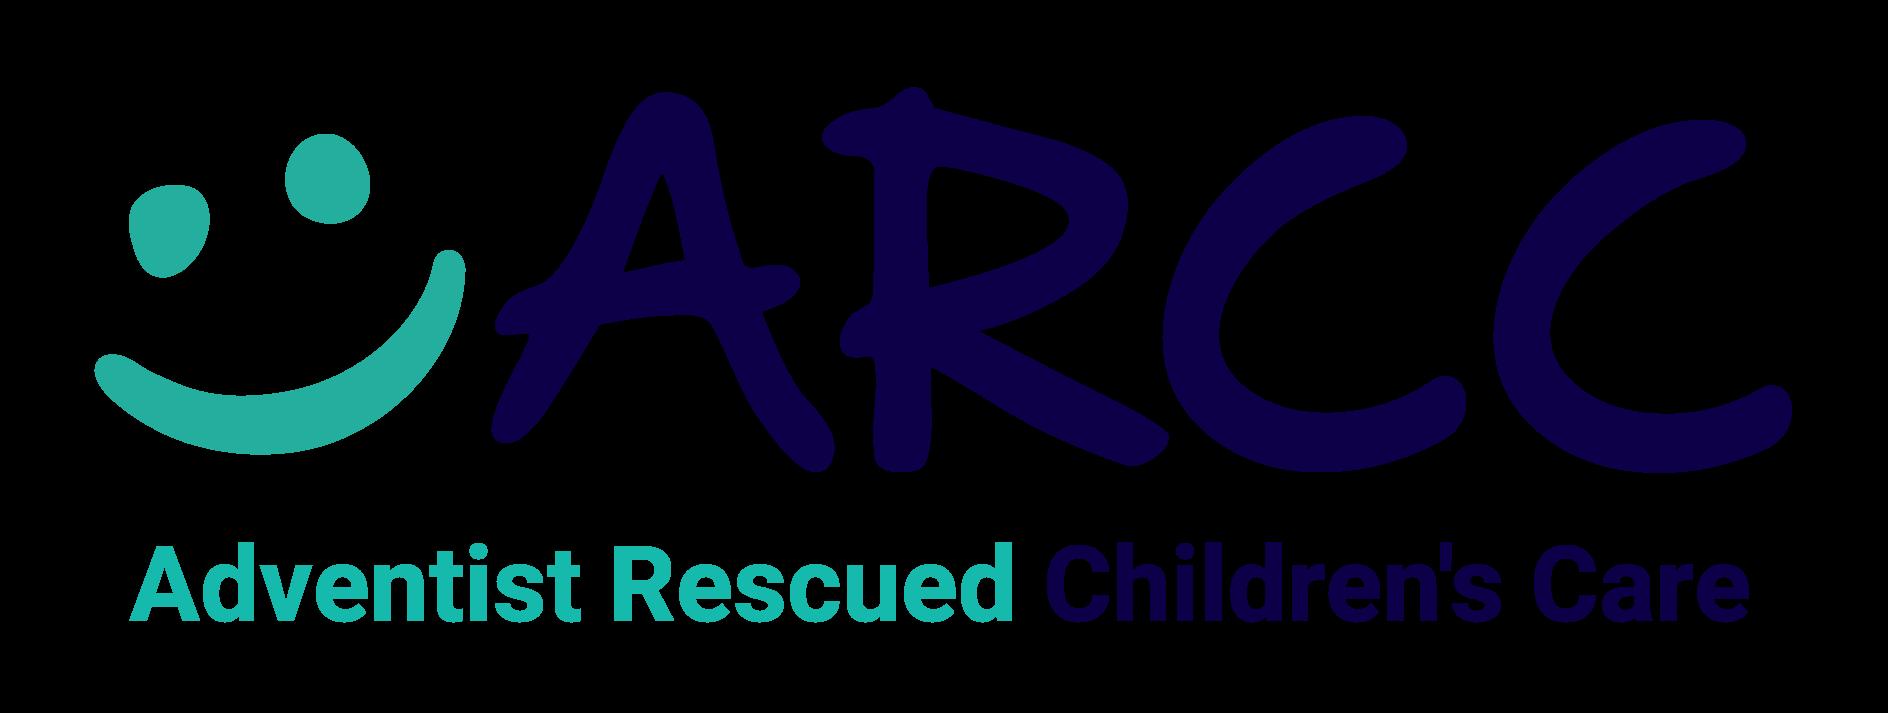 Adventist Rescued Children's Care